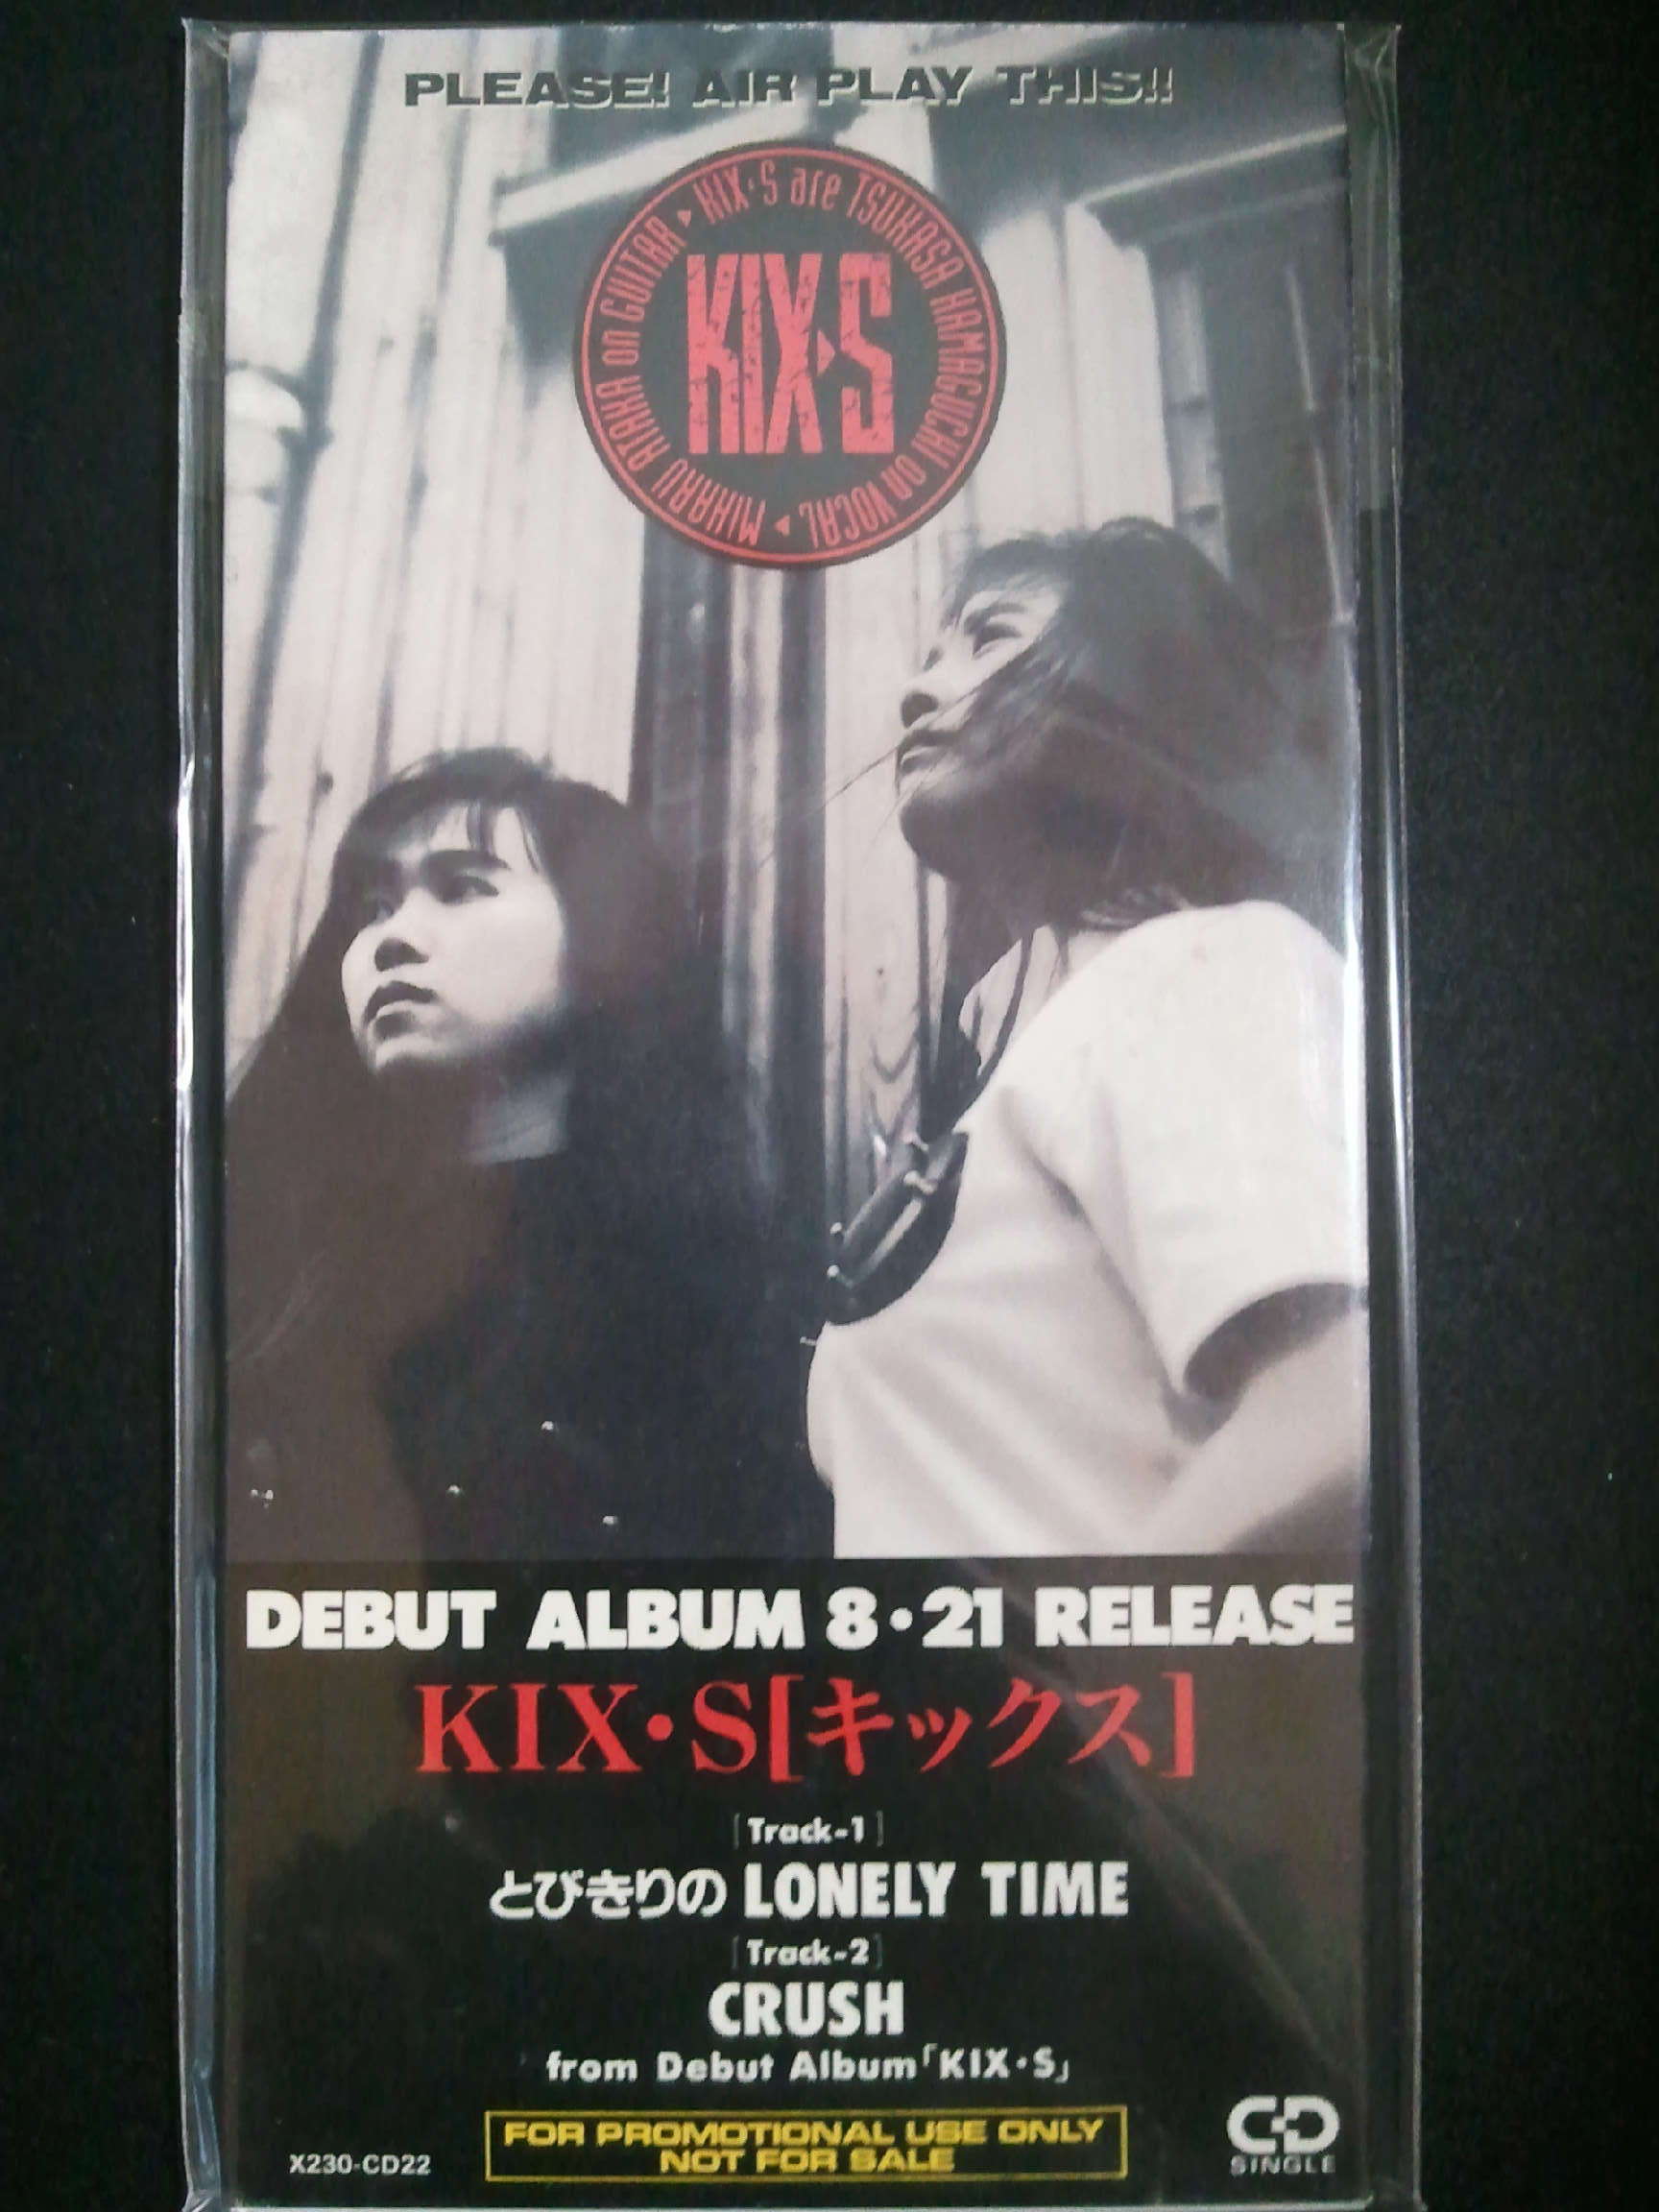 Kix・s とびきりのLonely Time - Crush 非売品